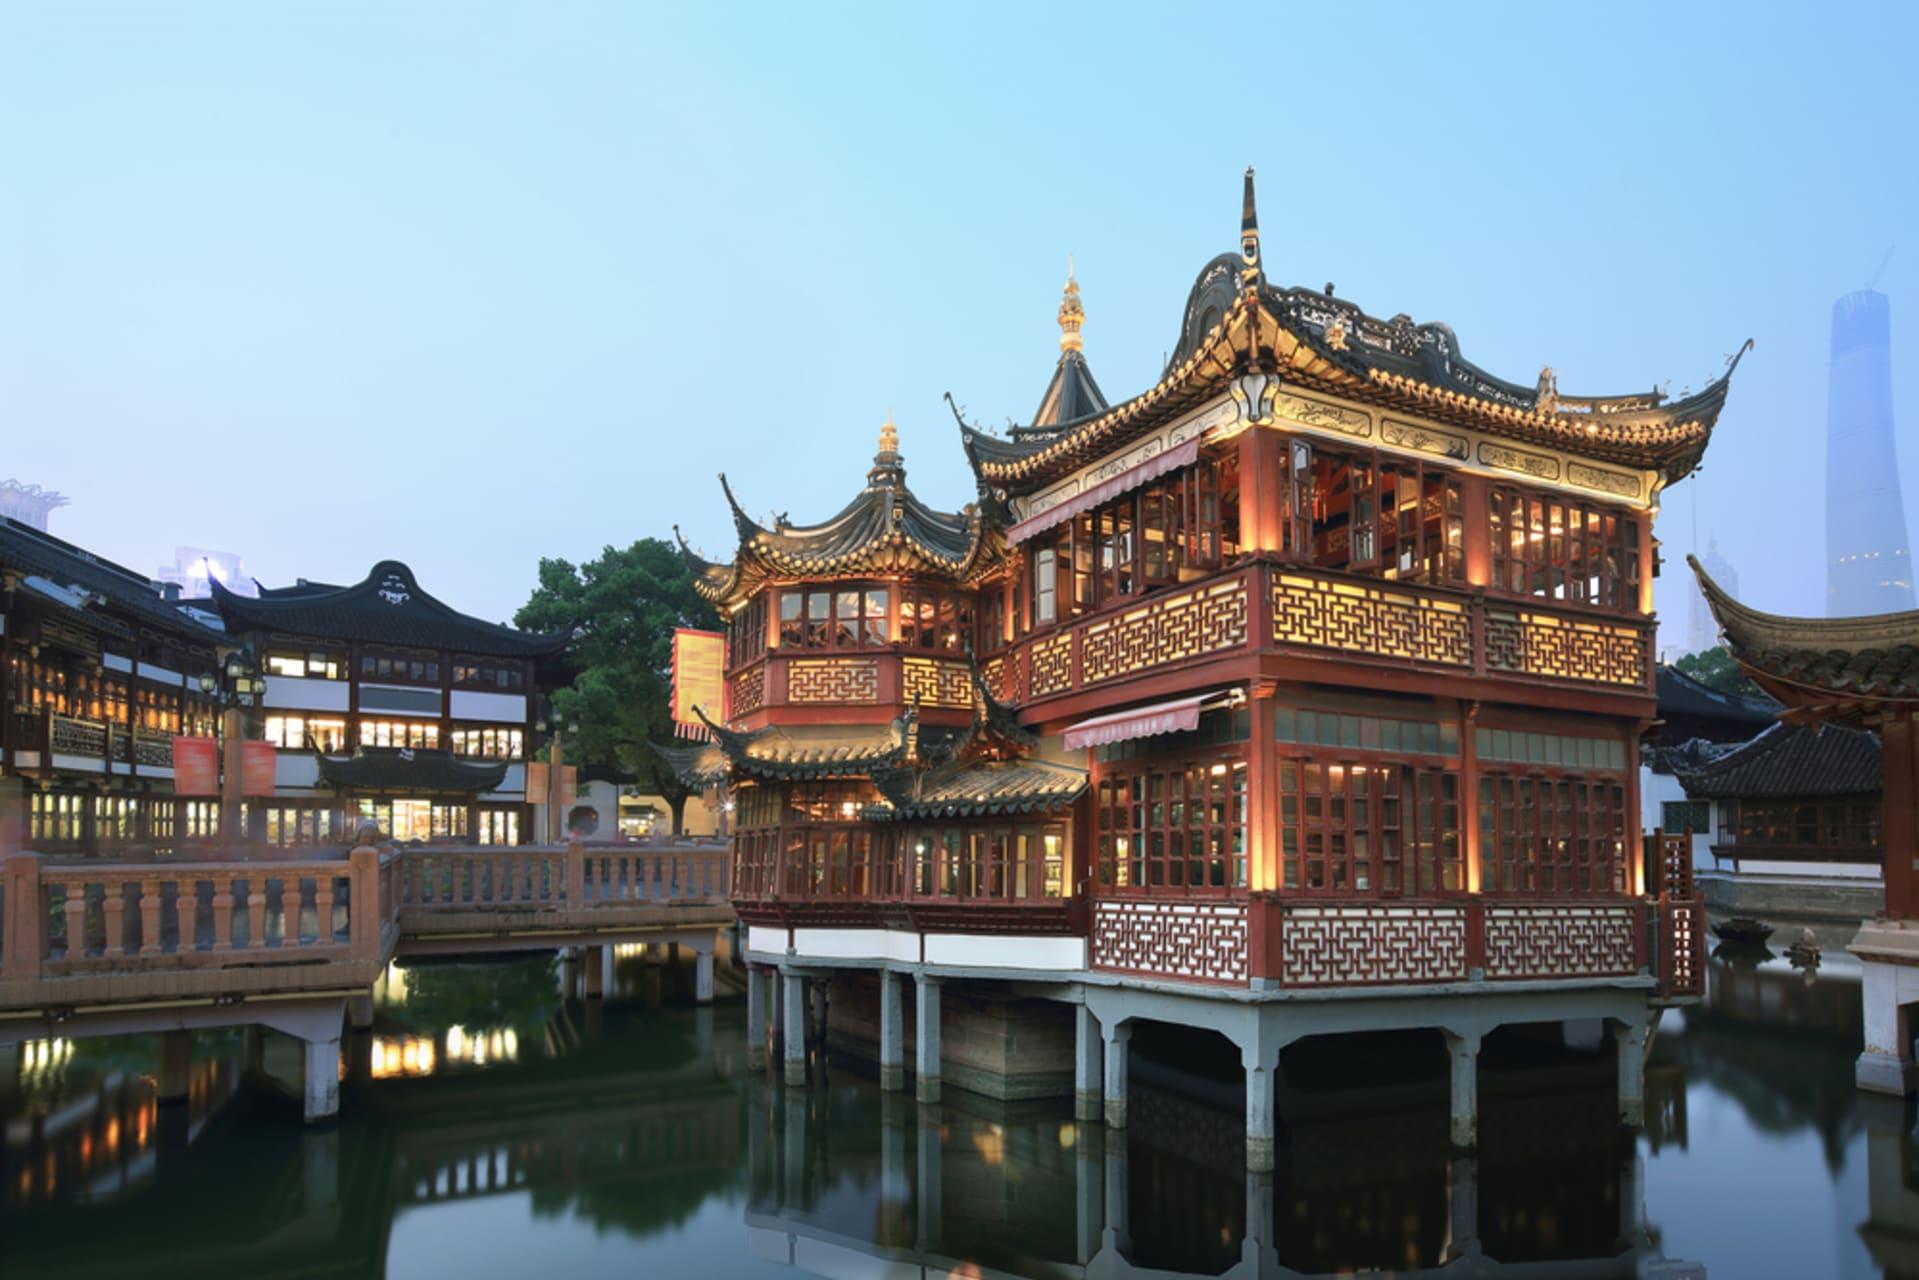 Shanghai - Yuyuan Bazaar: Historical Center of Shanghai